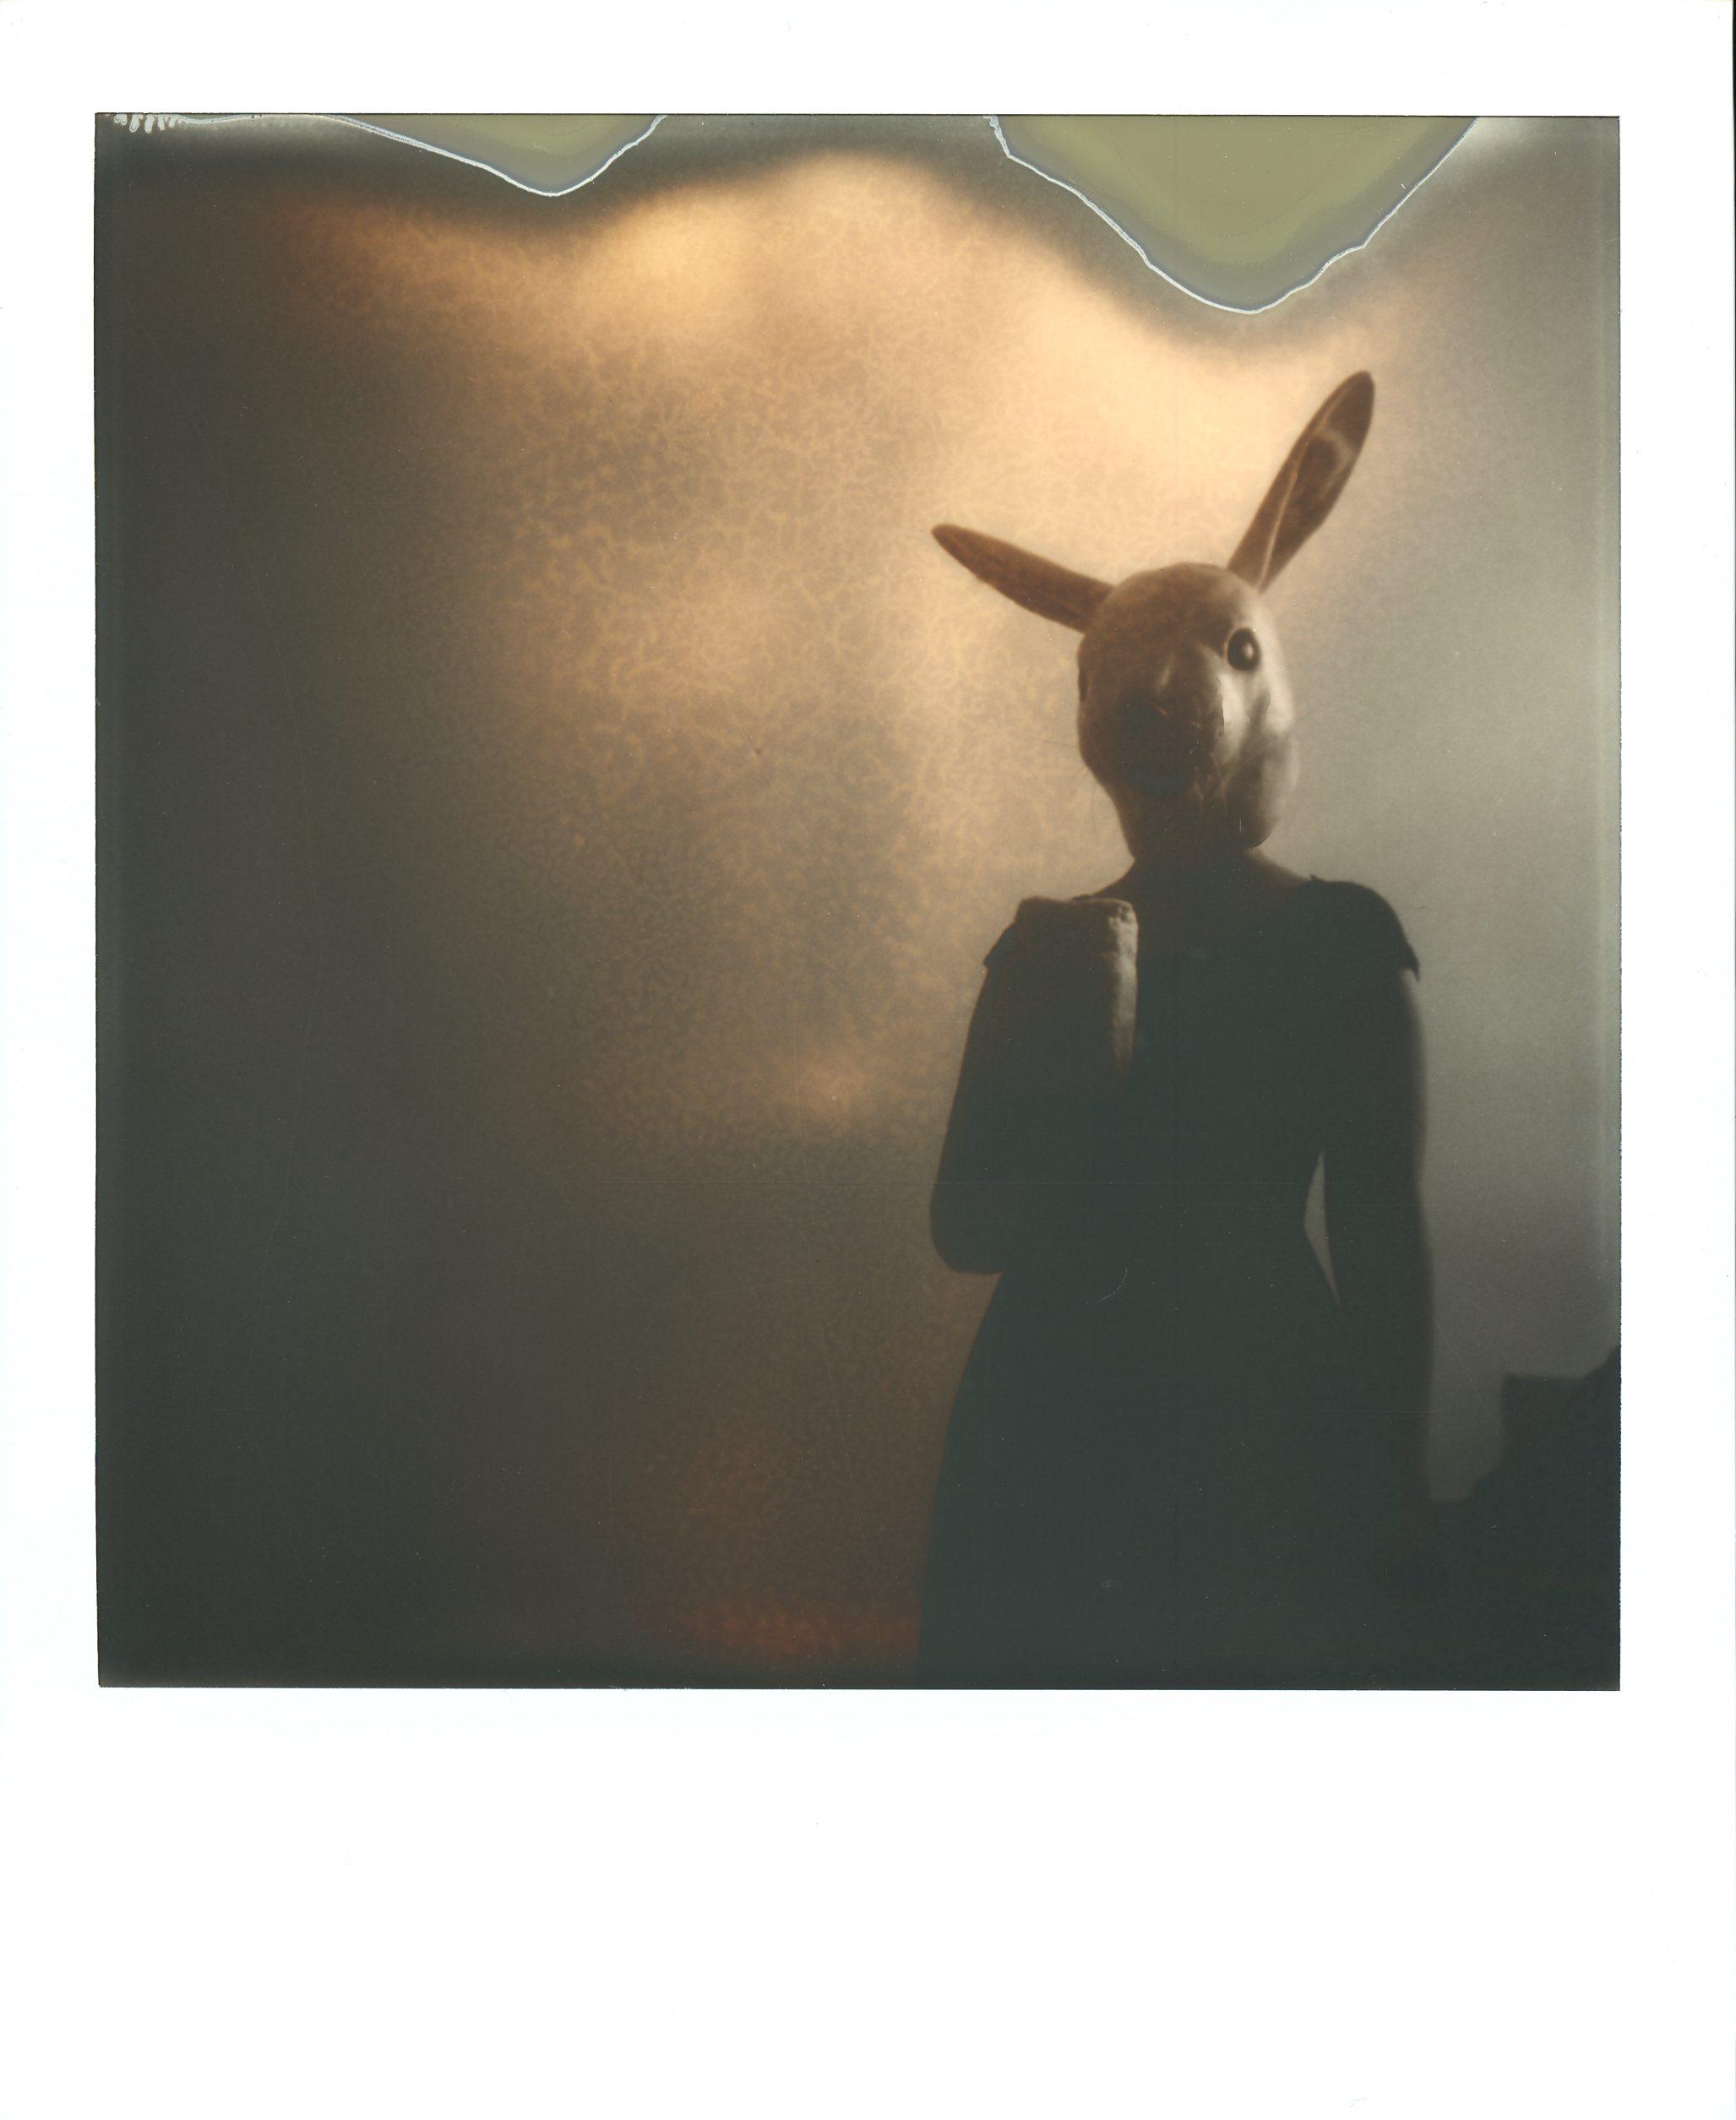 DARK-Little rabbit